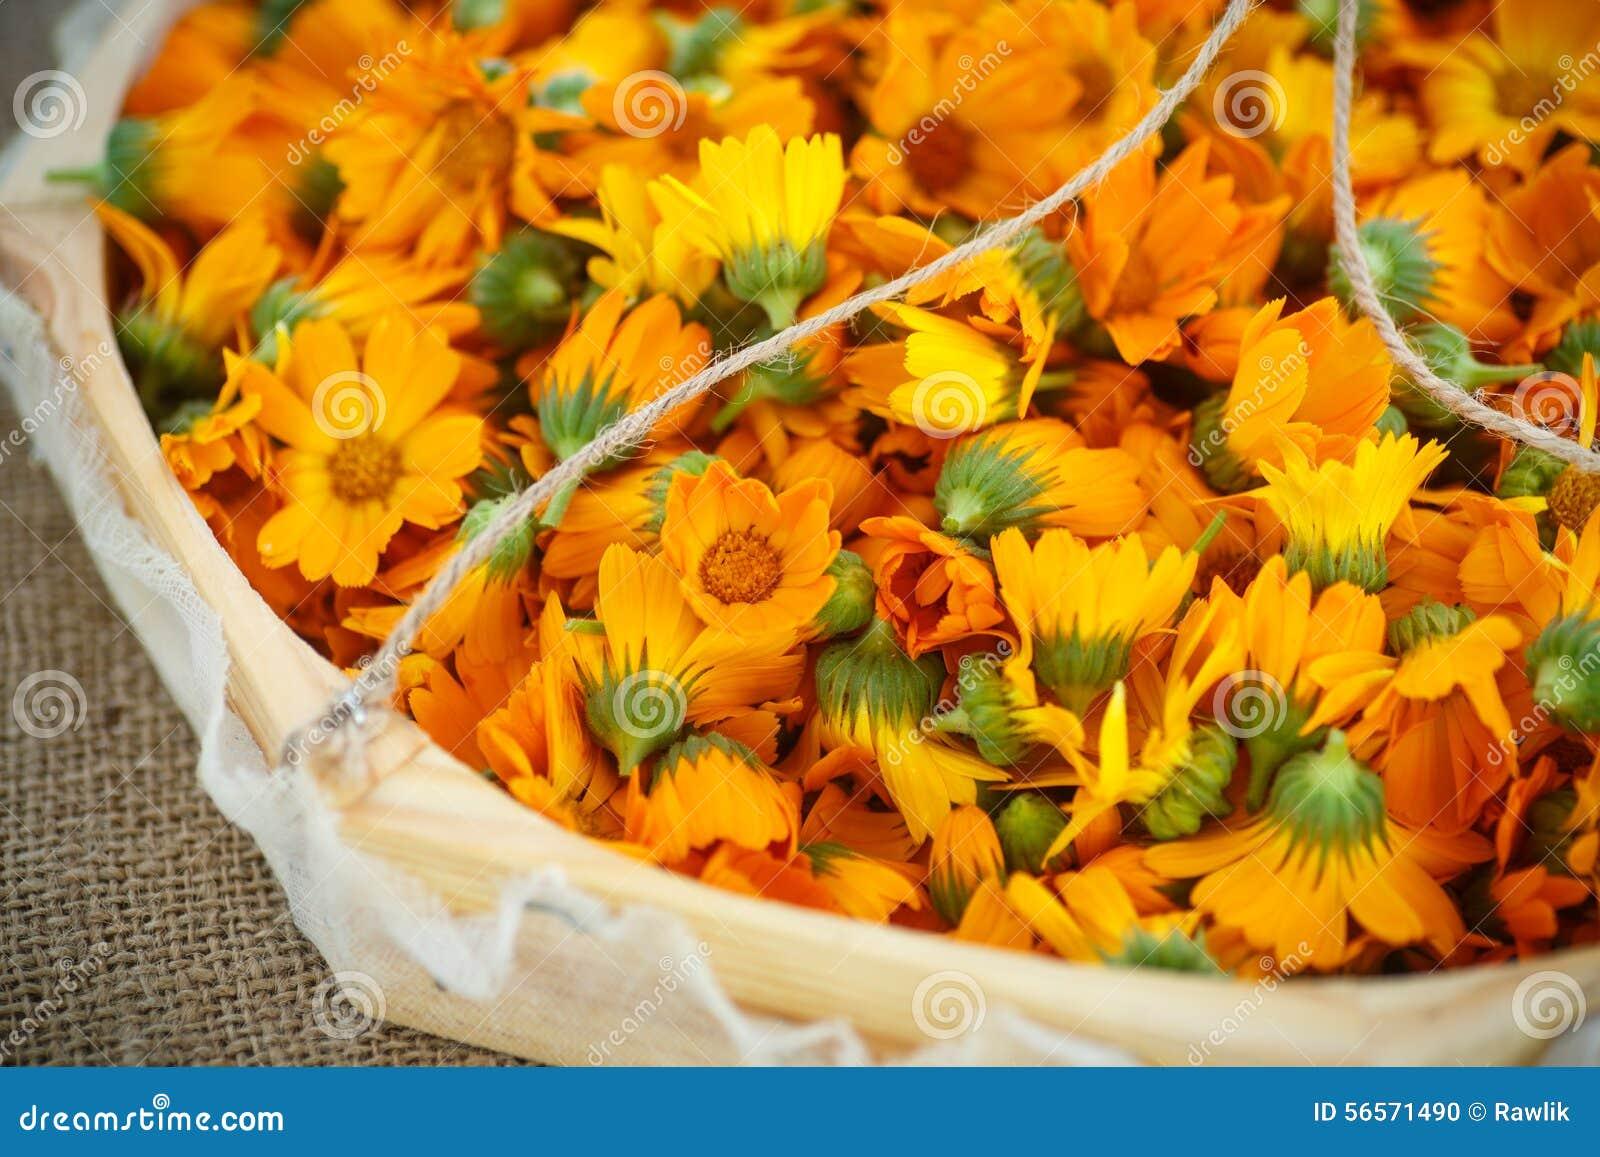 Download Calendula στοκ εικόνες. εικόνα από λουλούδι, burlap, συστατικό - 56571490